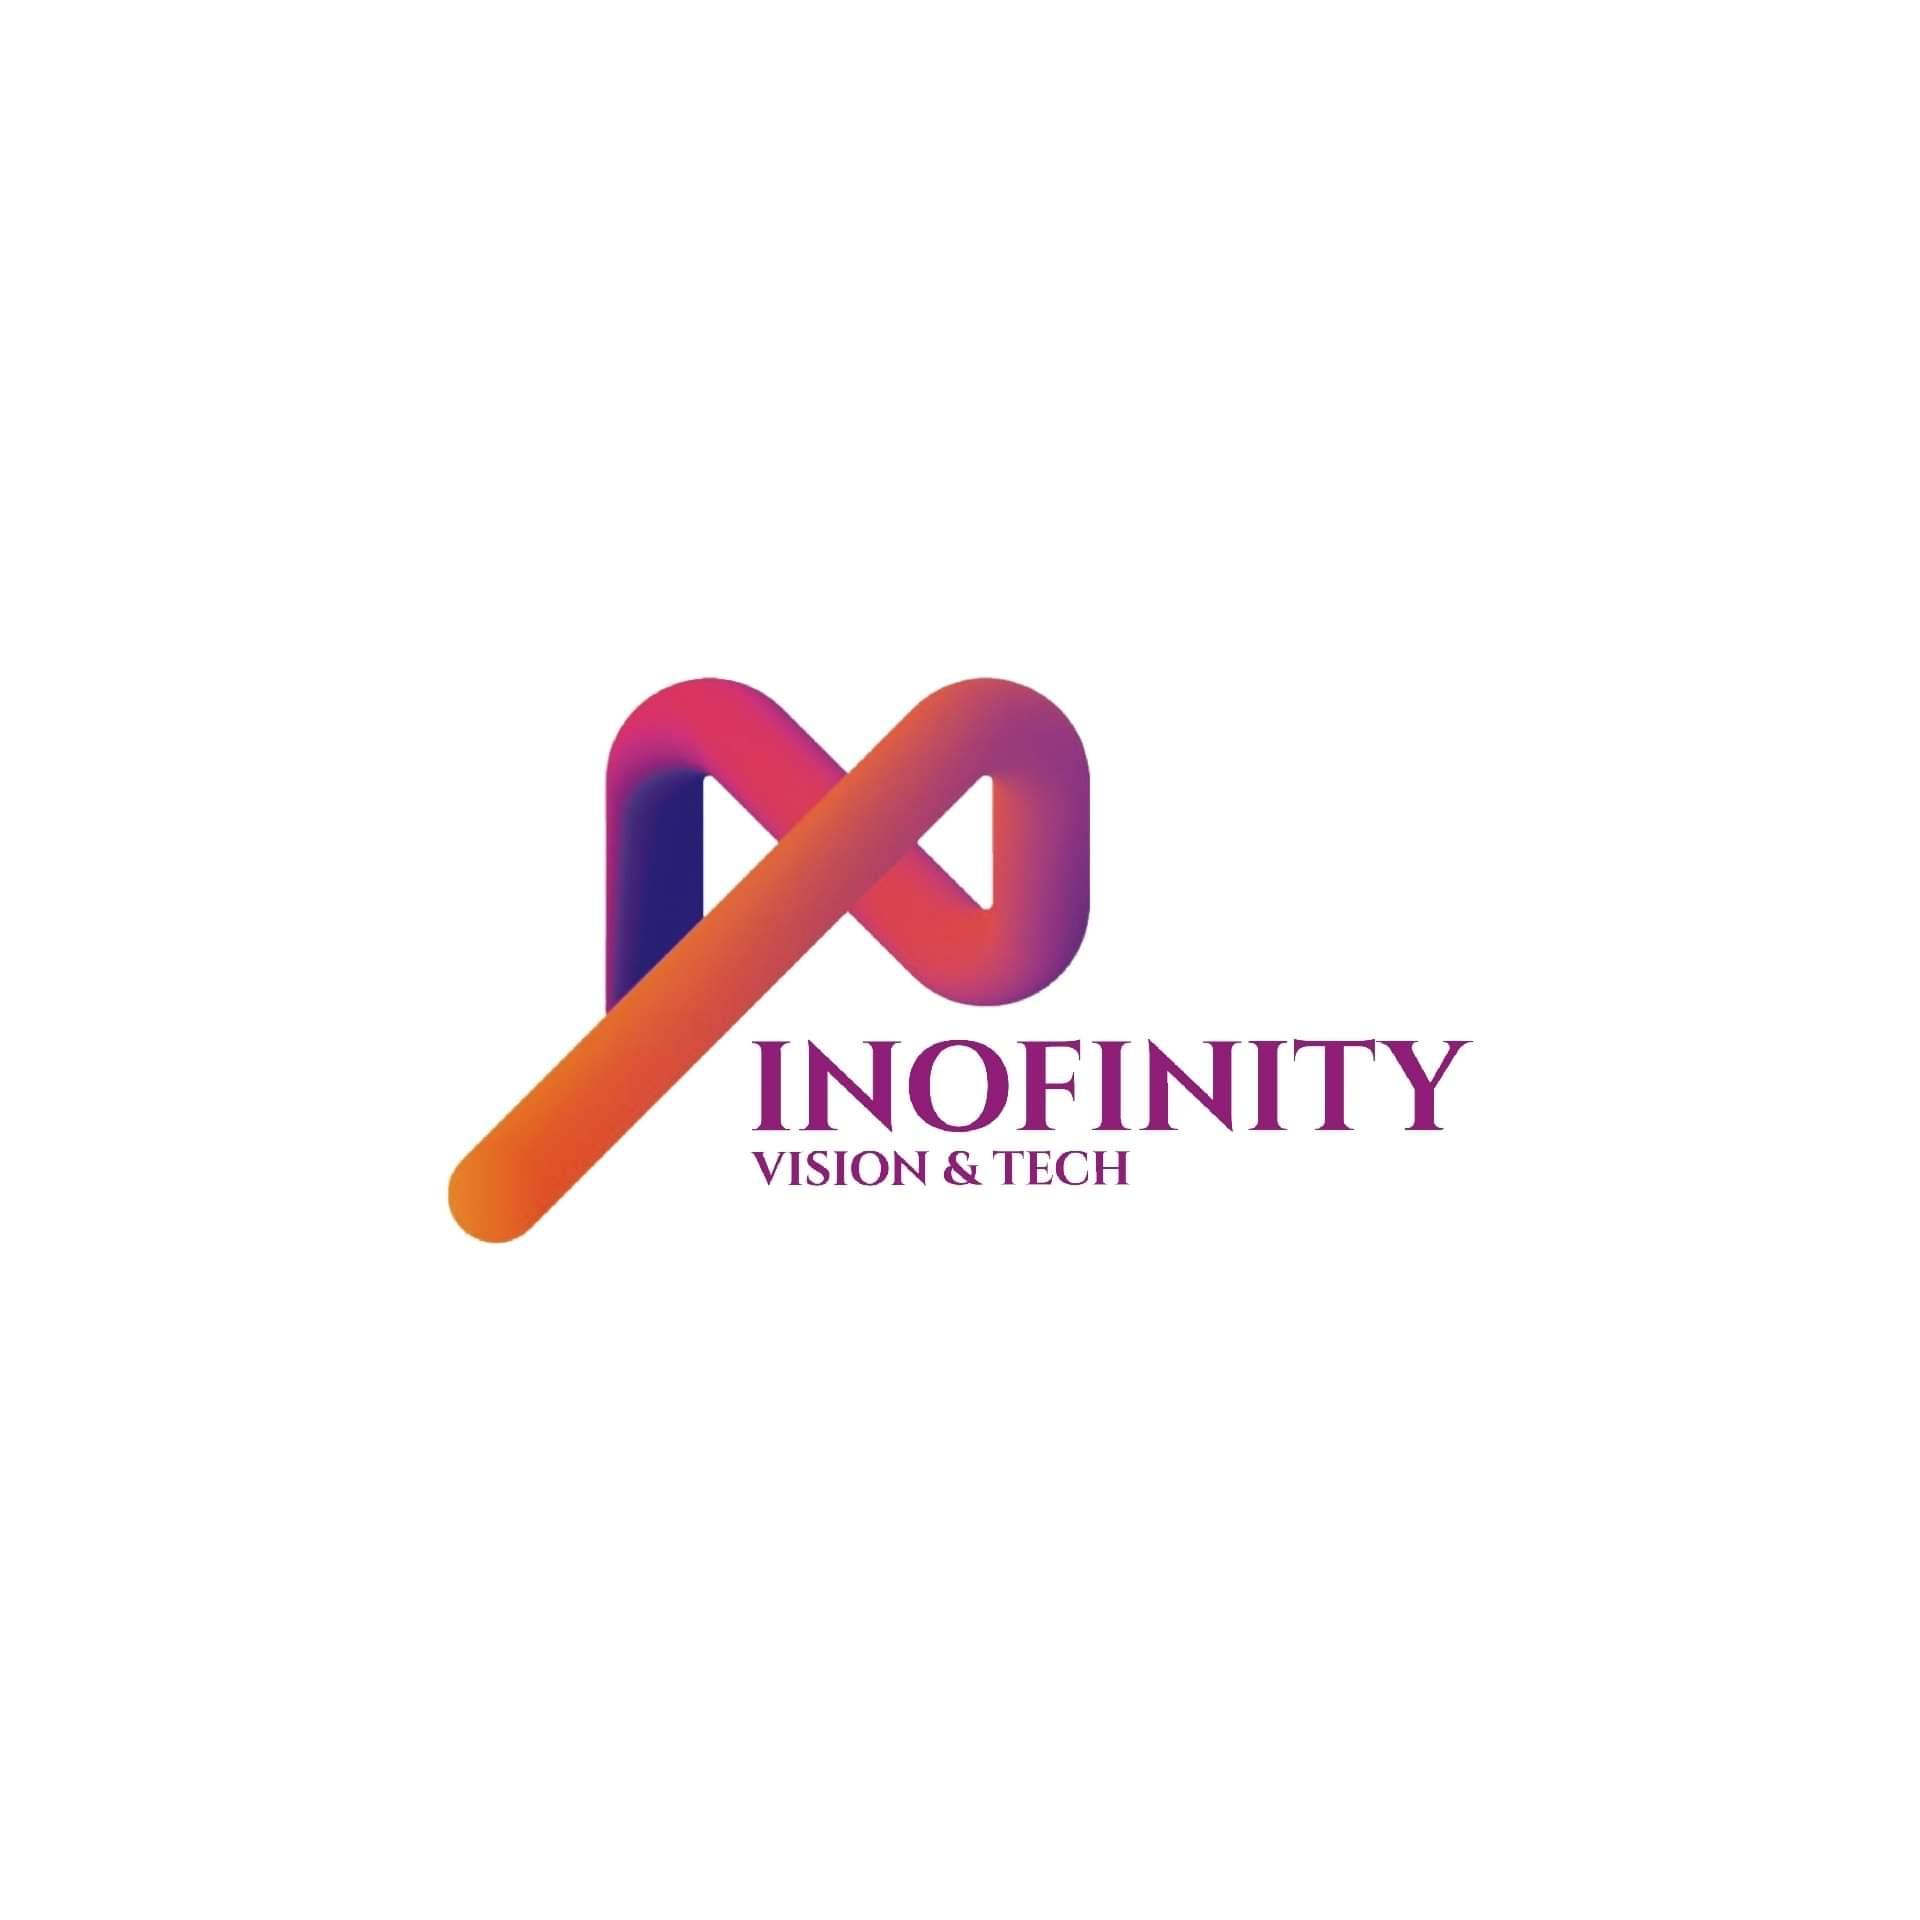 Inofinity Vision & Tech